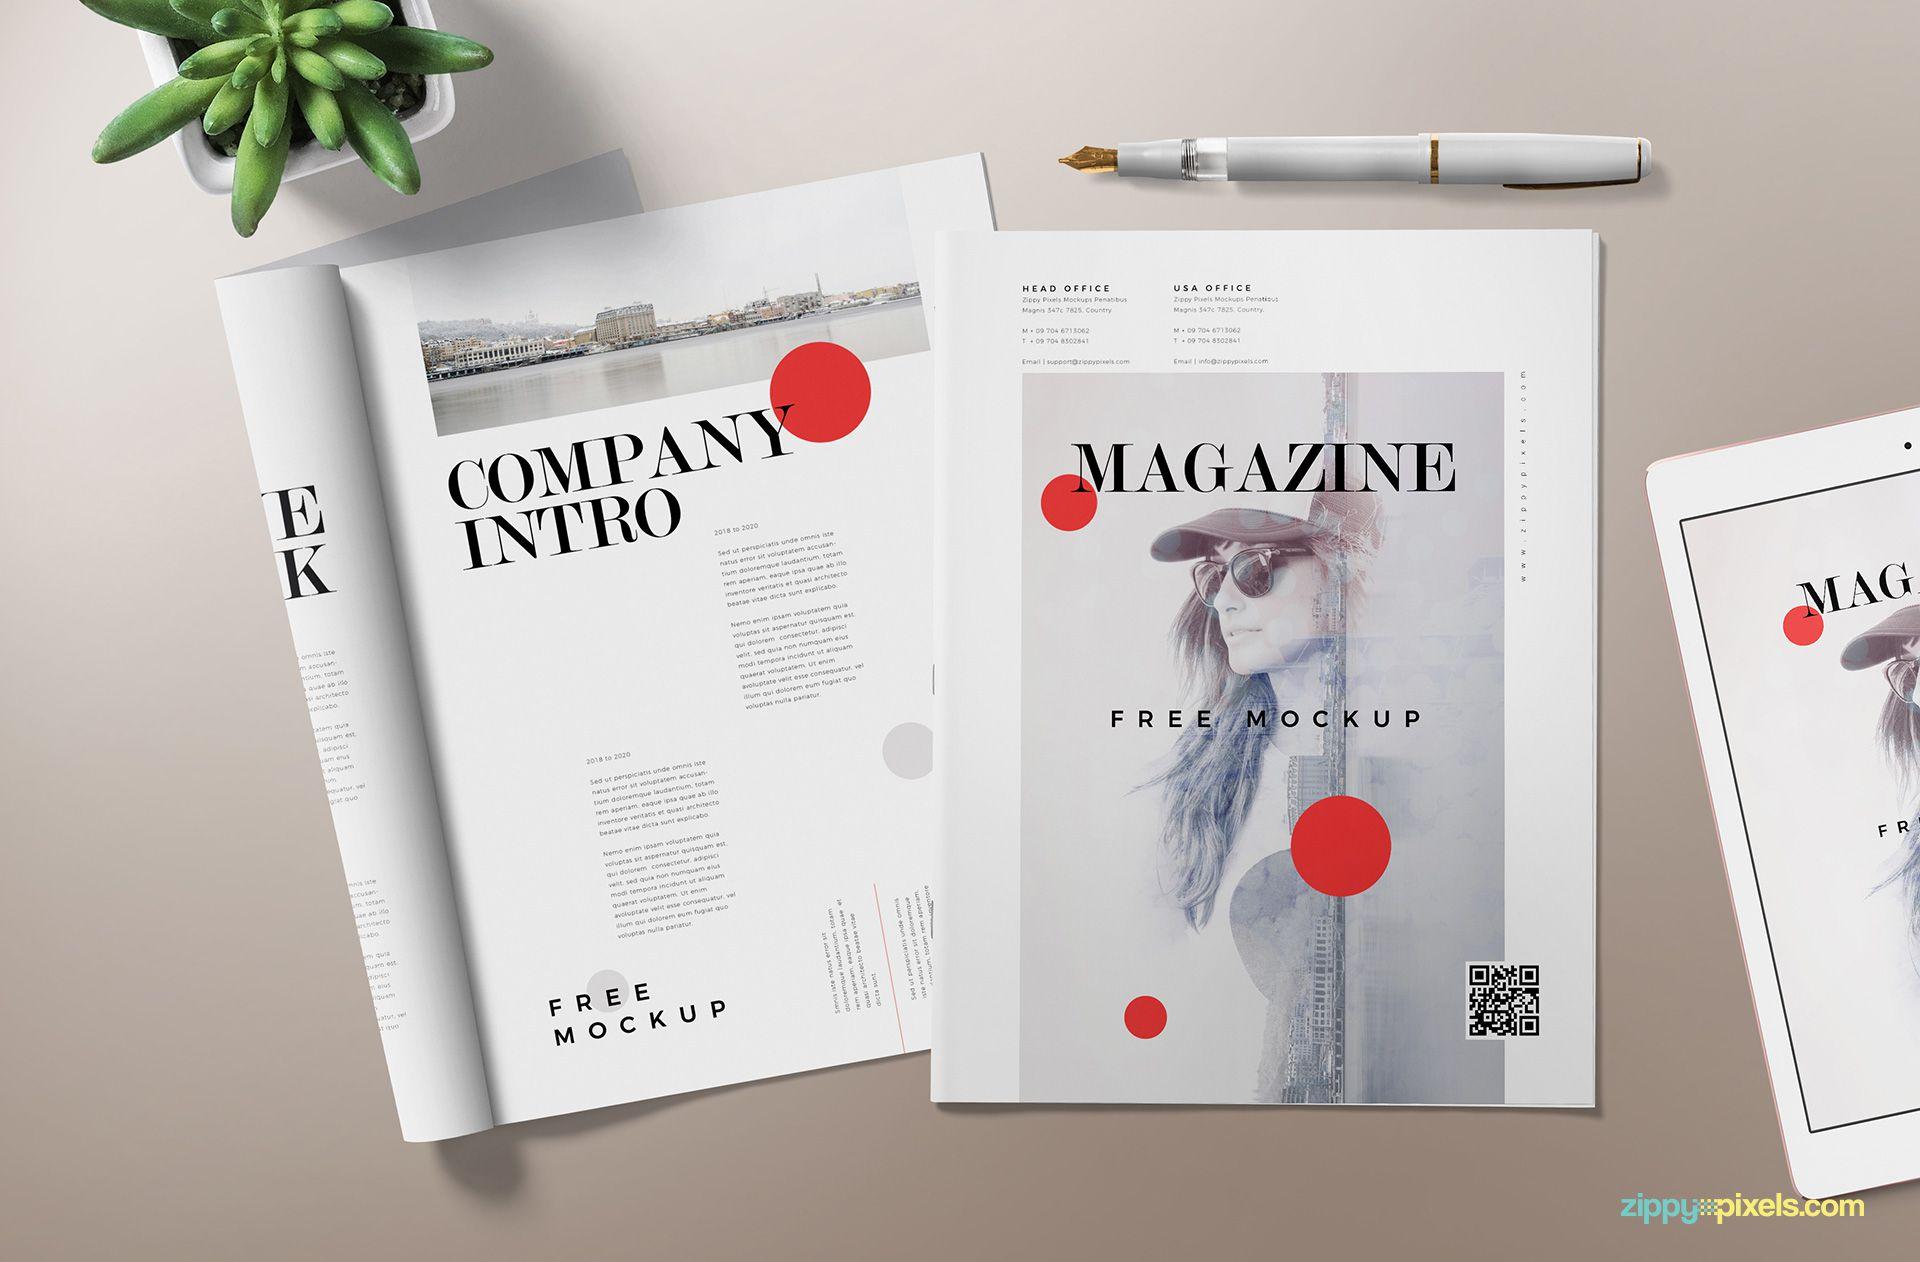 Fully customizable magazine mockup scene.